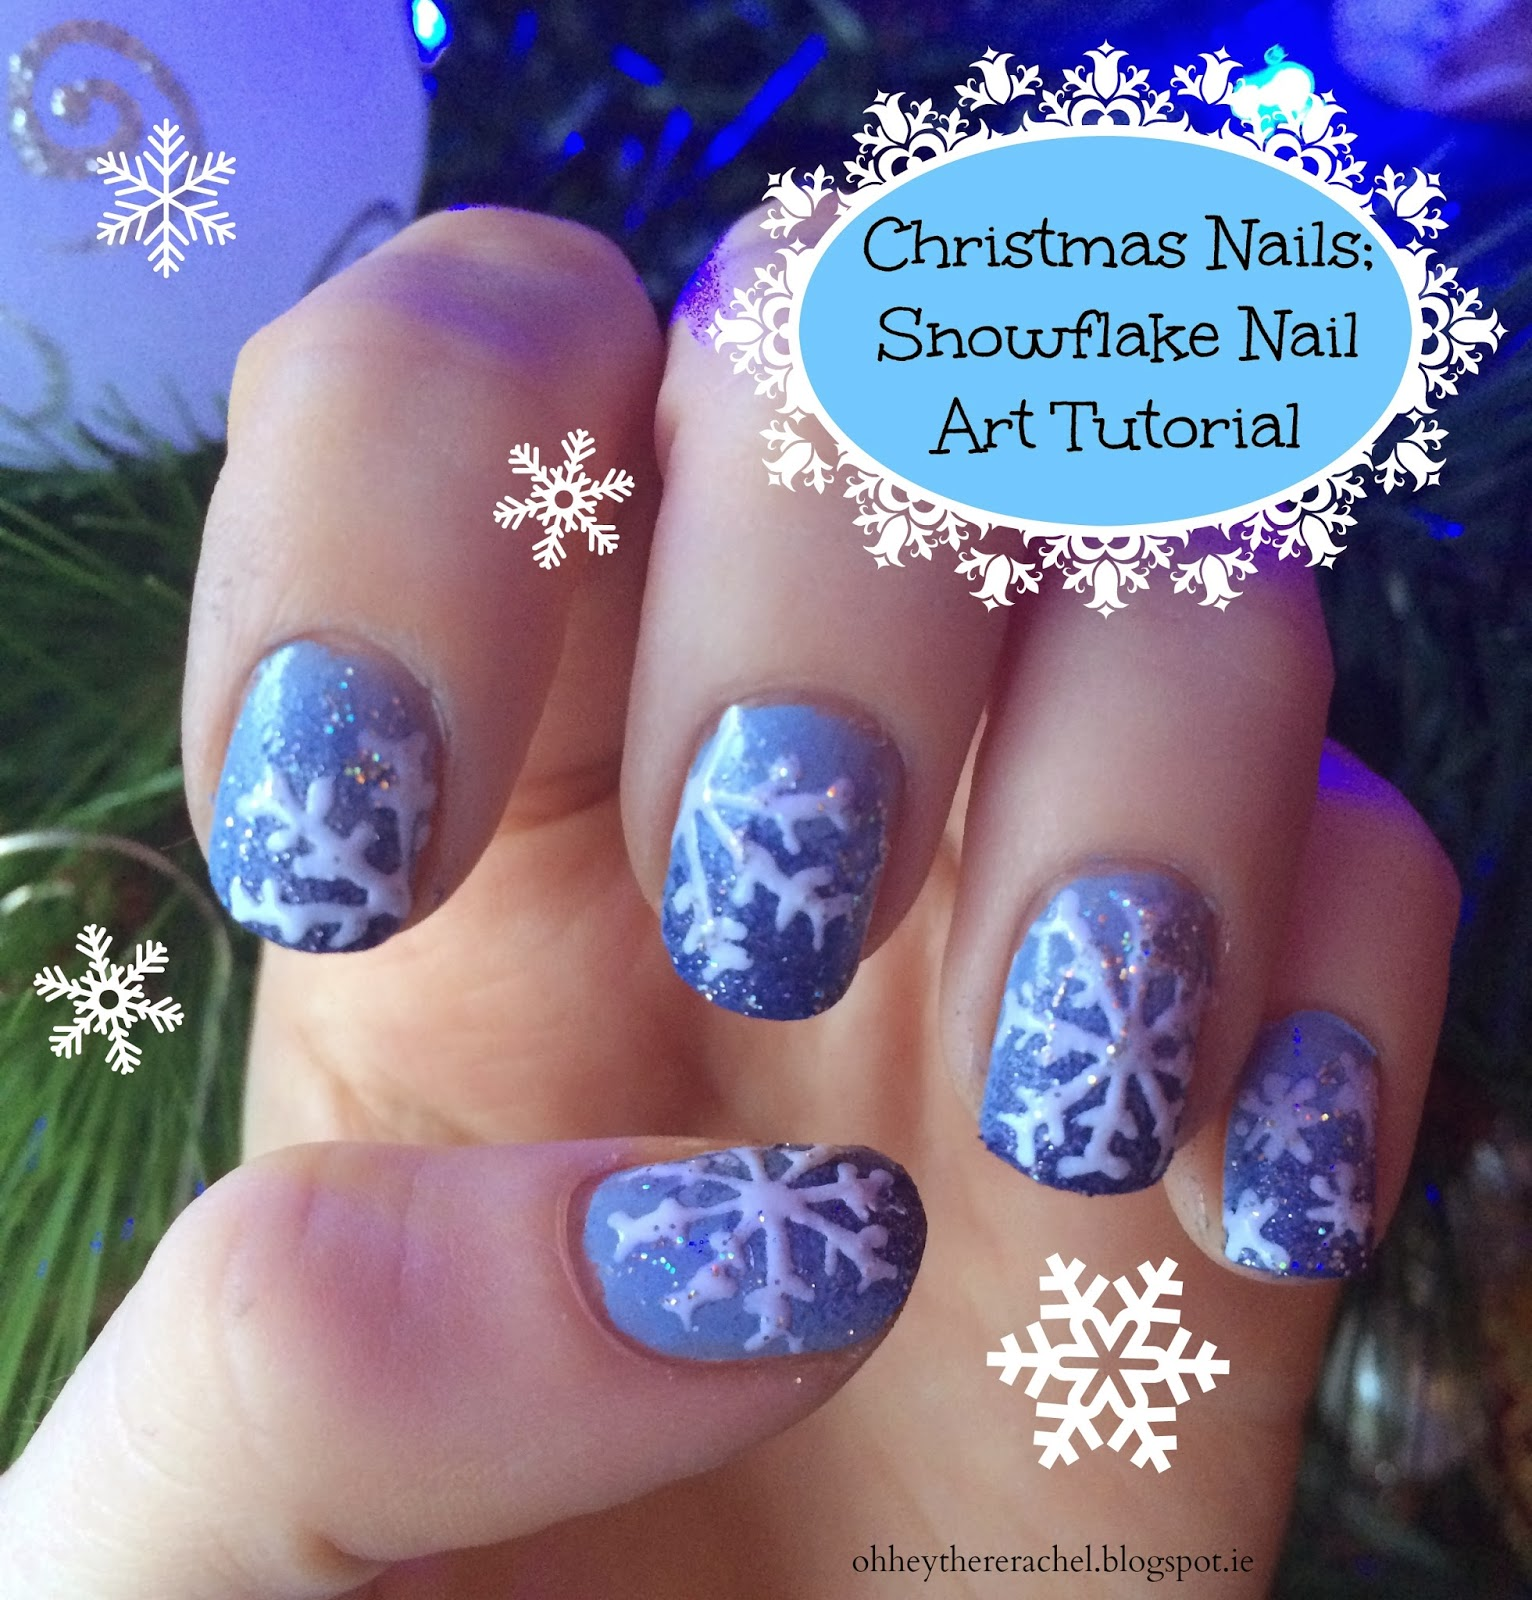 Christmas nails snowflake nail art tutorial oh hey there rachel christmas nails snowflake nail art tutorial prinsesfo Choice Image